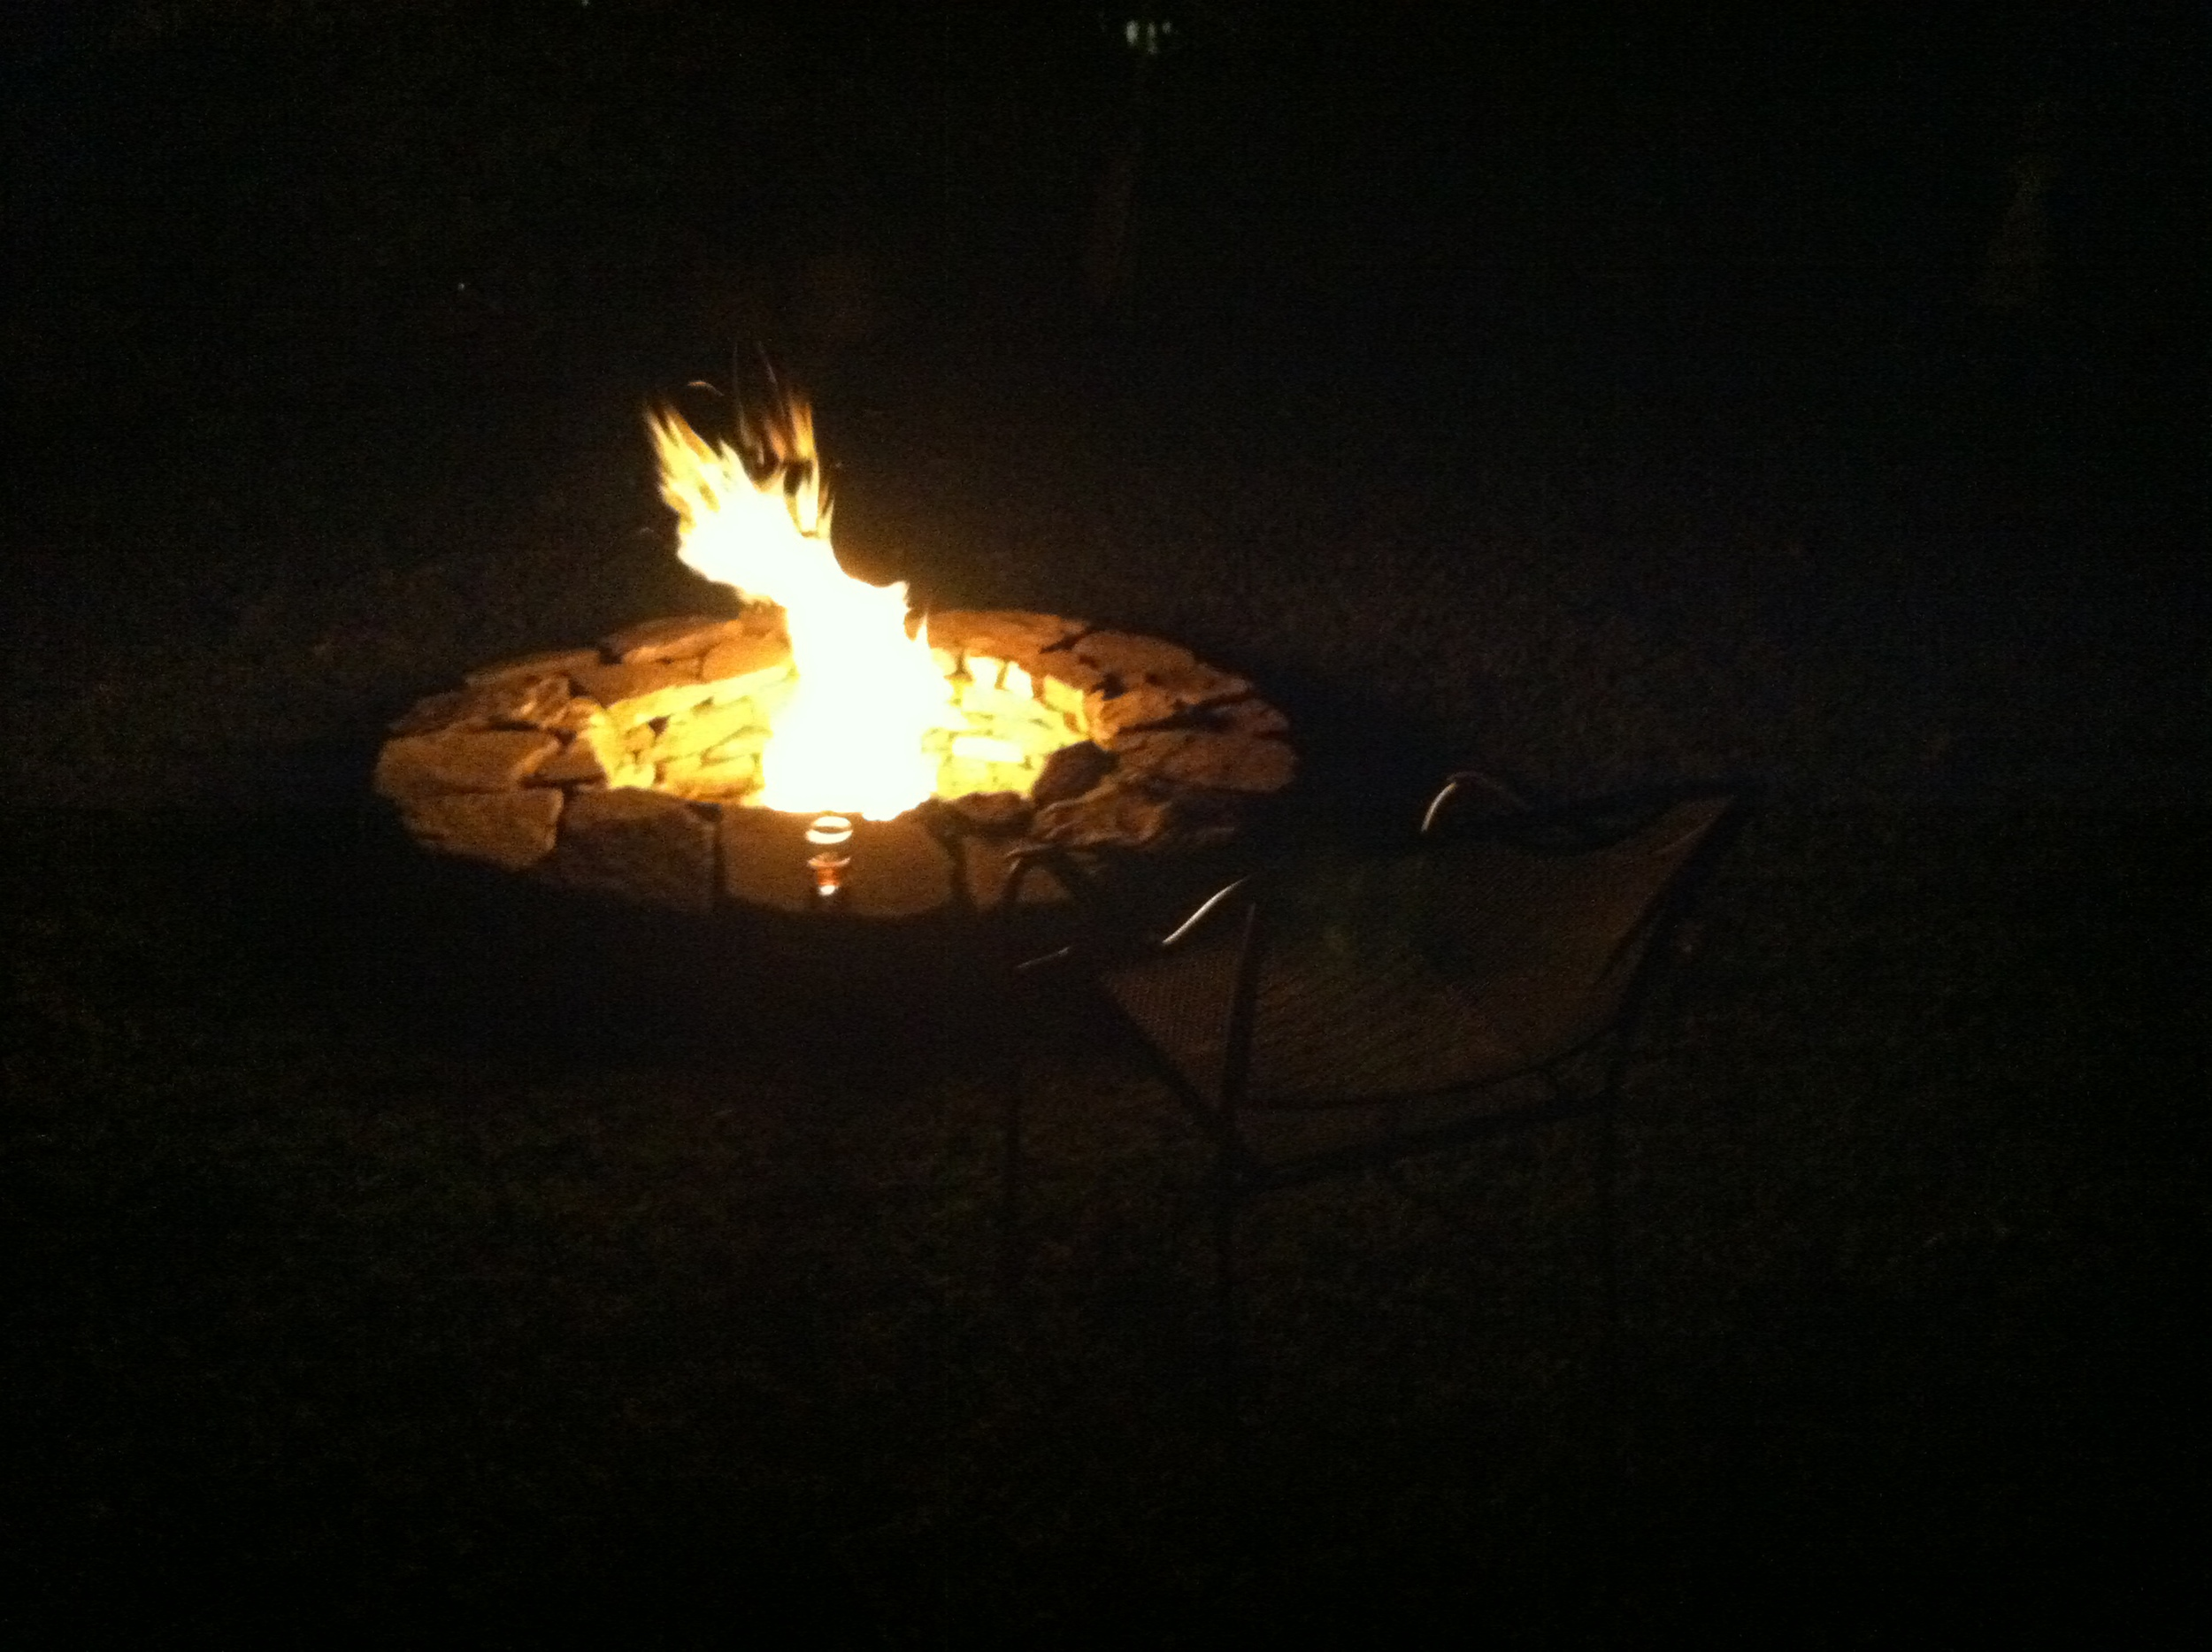 Fire pit alight